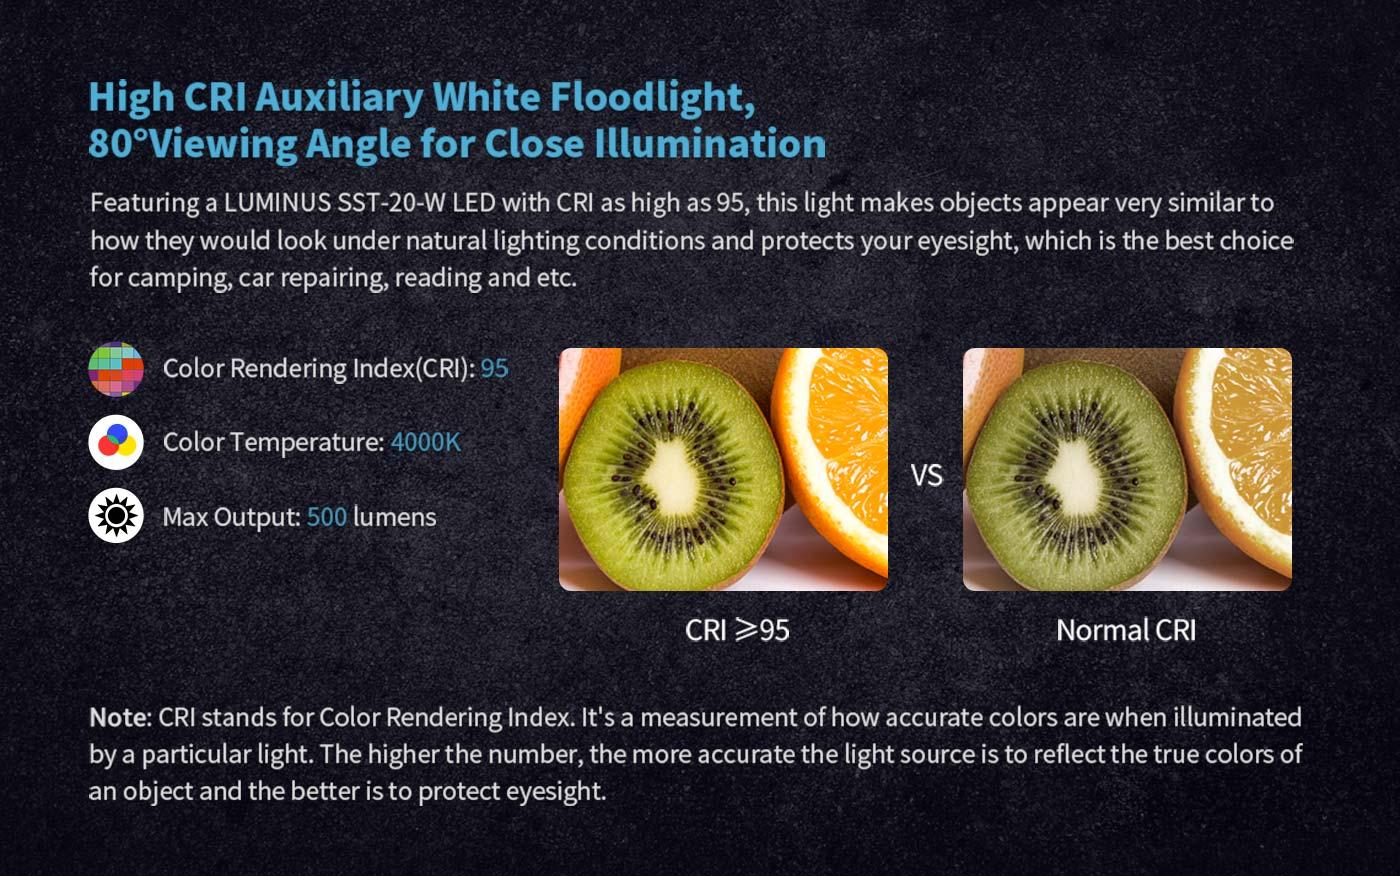 wide angle led headlamp, led headtorch reflecting real world